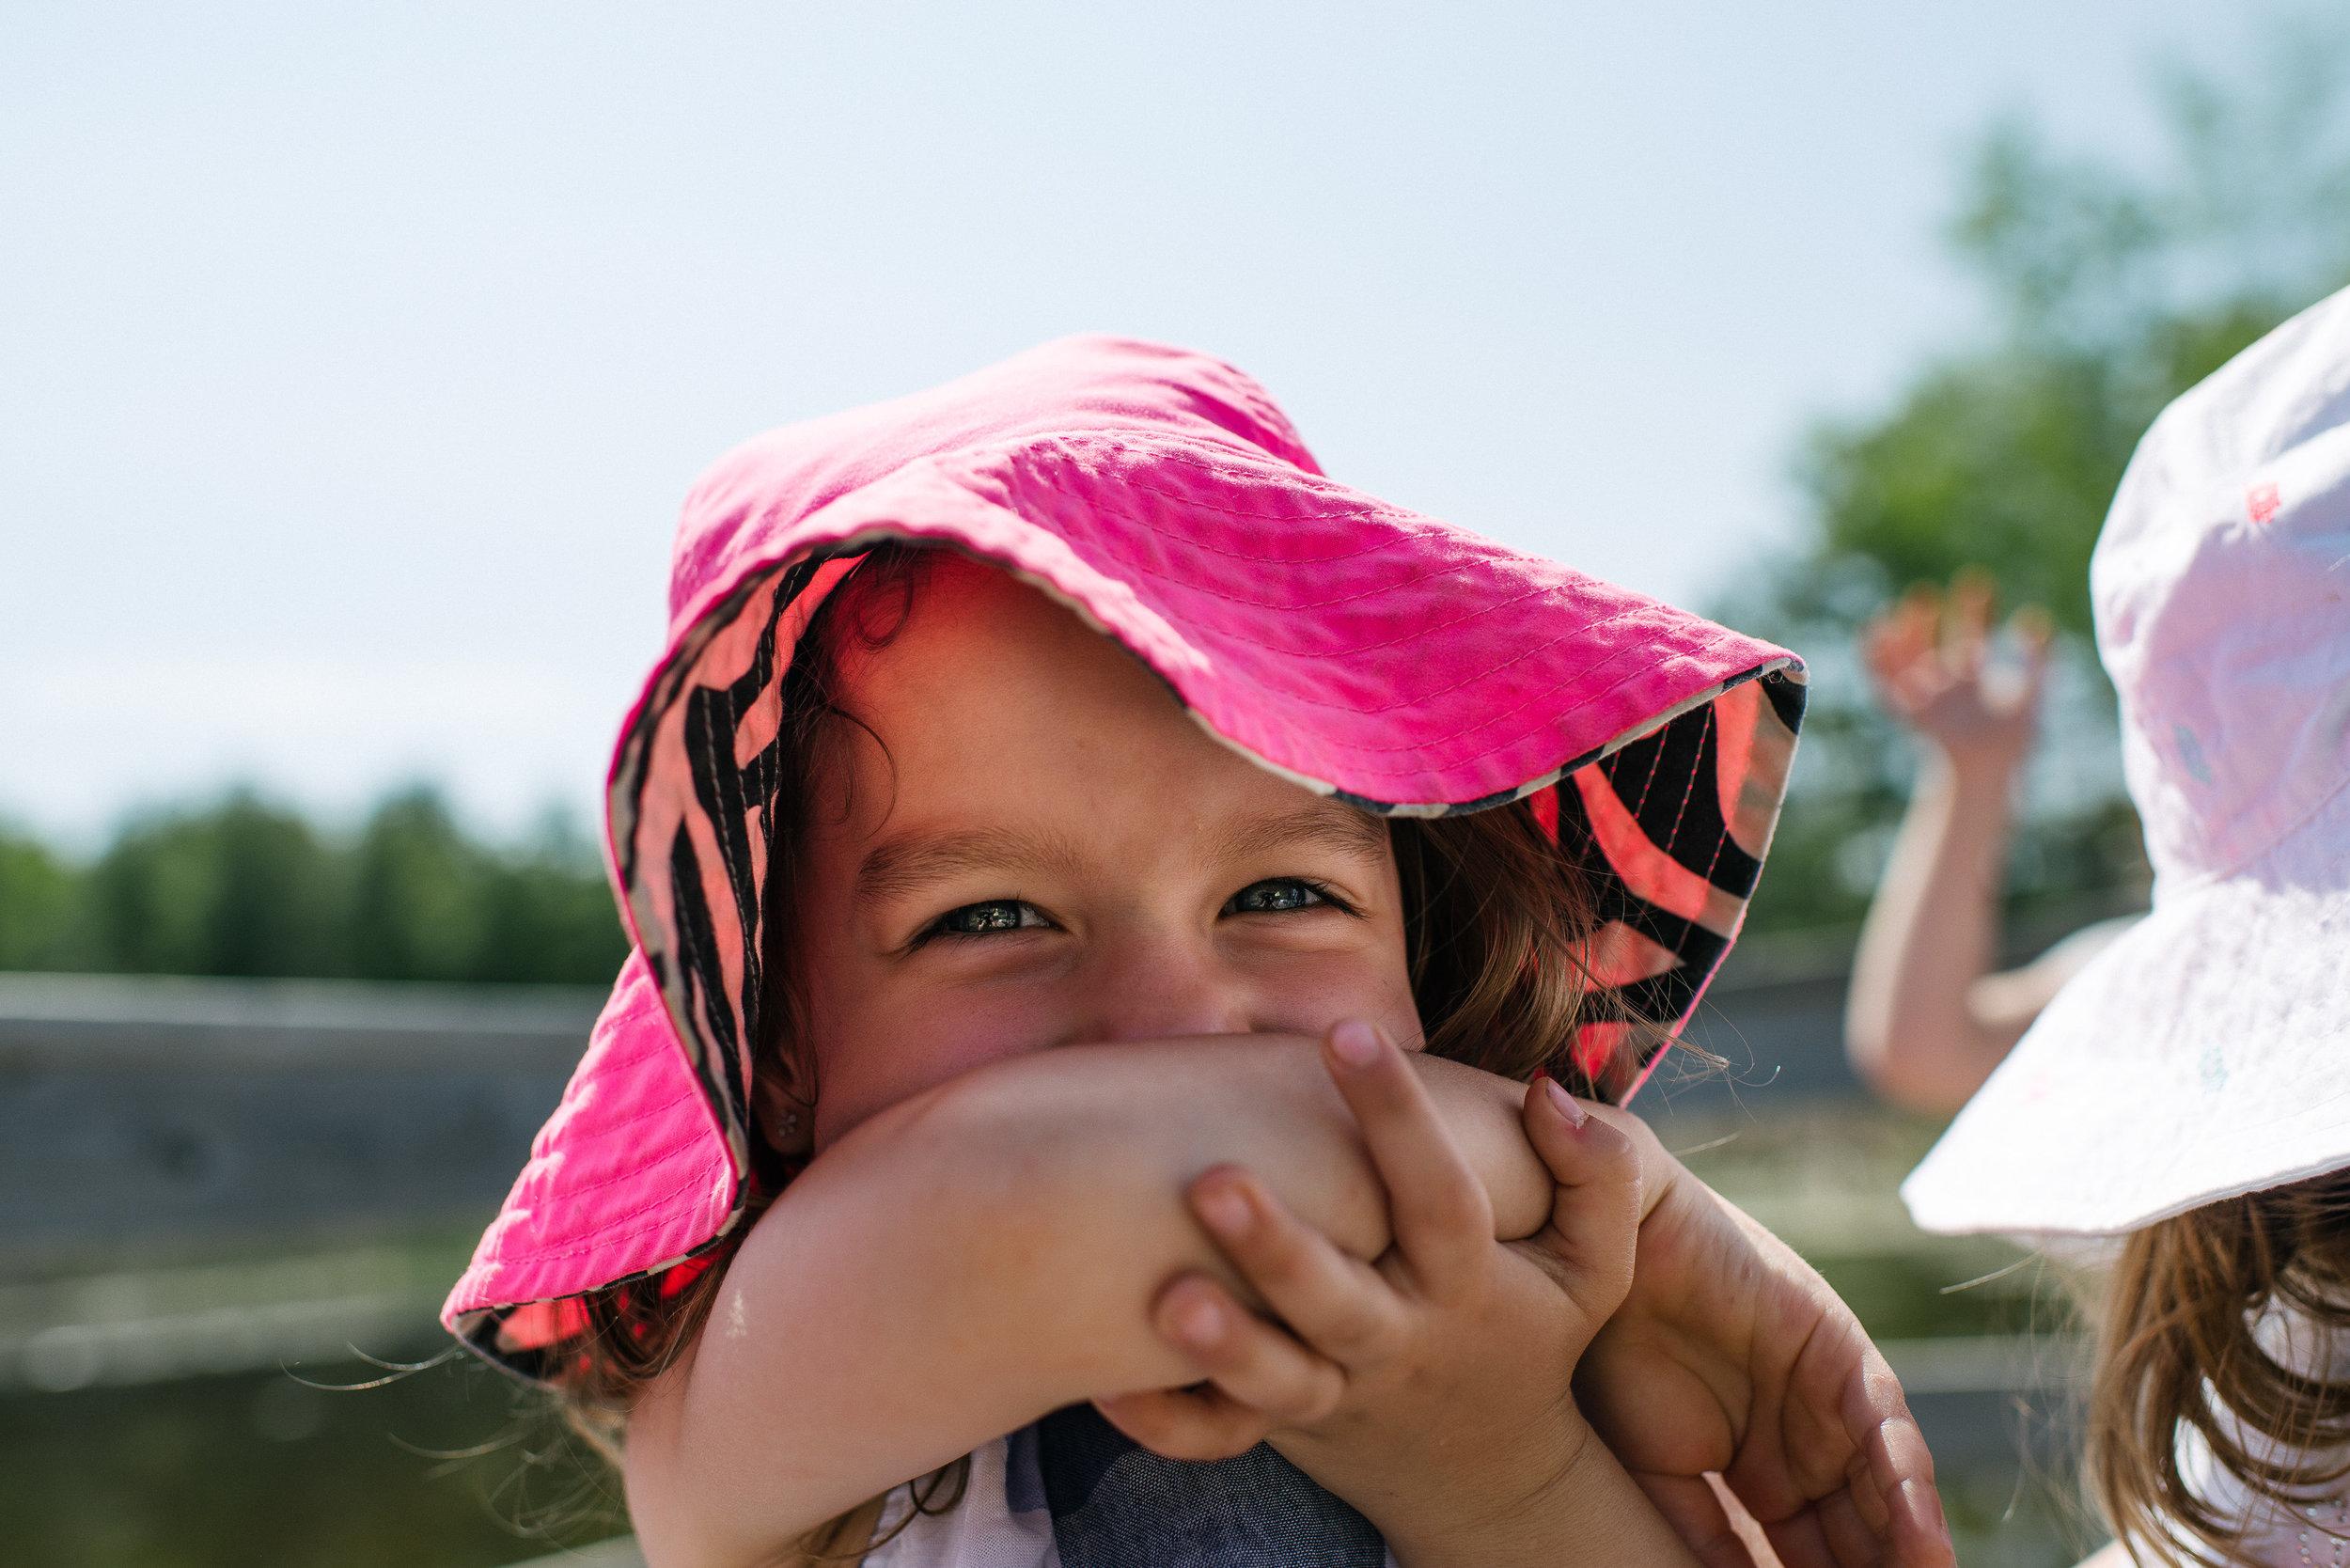 documentary school photography viara mileva kingston toronto ottawa-110210vm.jpg